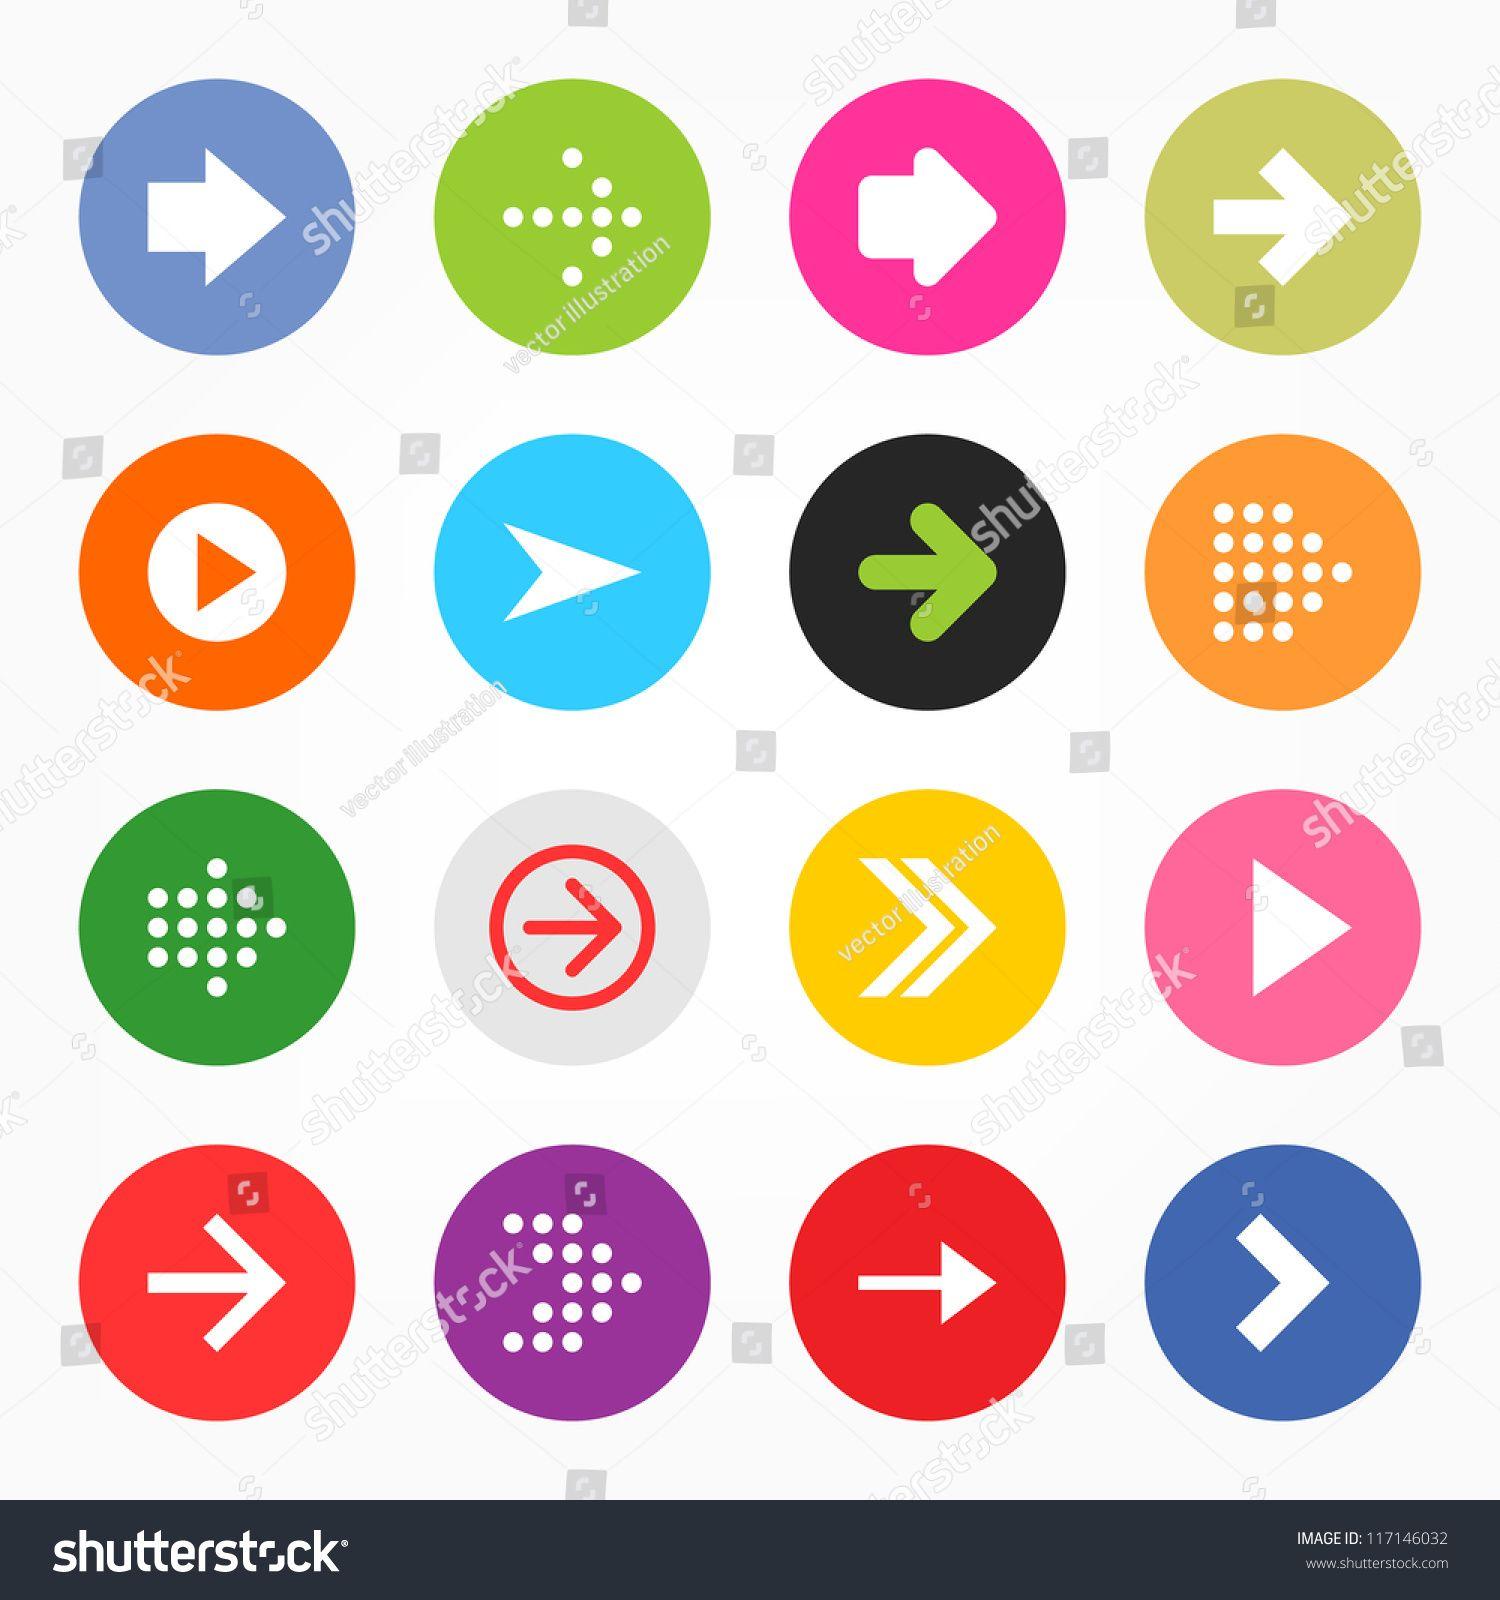 Arrow sign icon set. Simple circle shape button